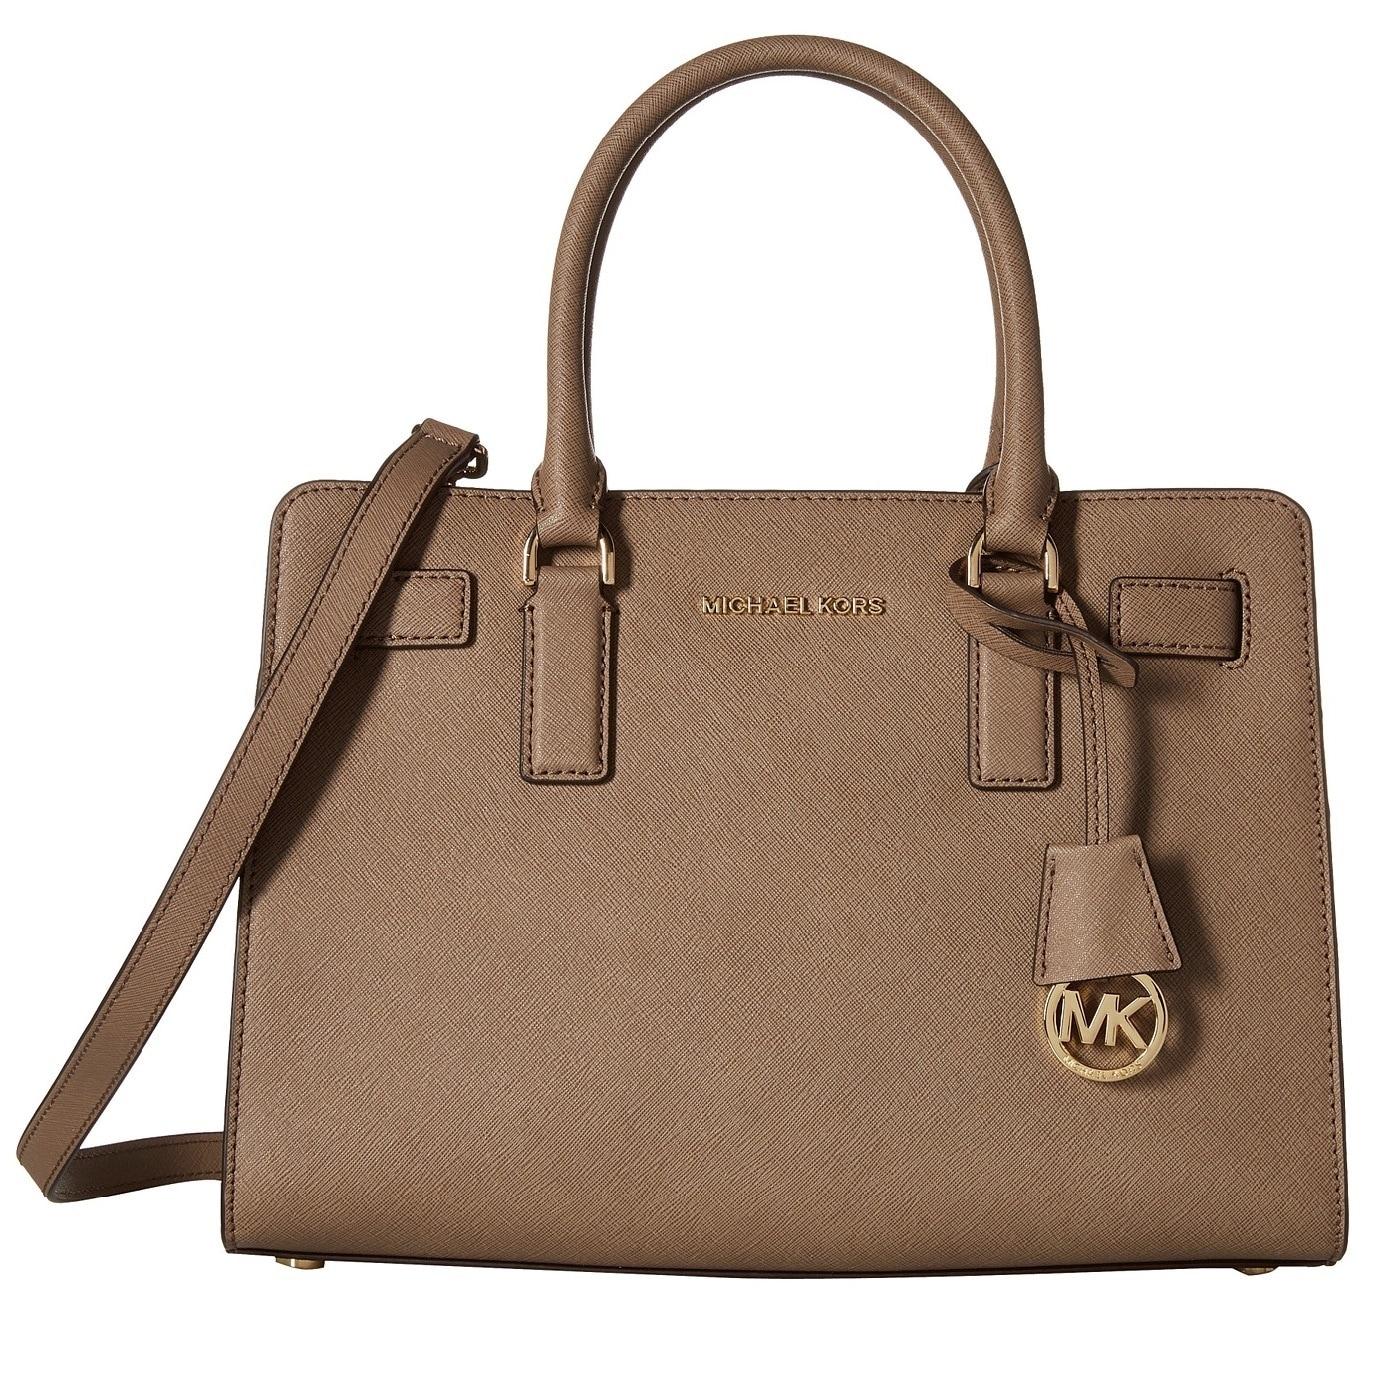 2a8986744edfce Shop Michael Kors Dillon East/West Satchel Handbag - Free Shipping Today -  Overstock - 10701568